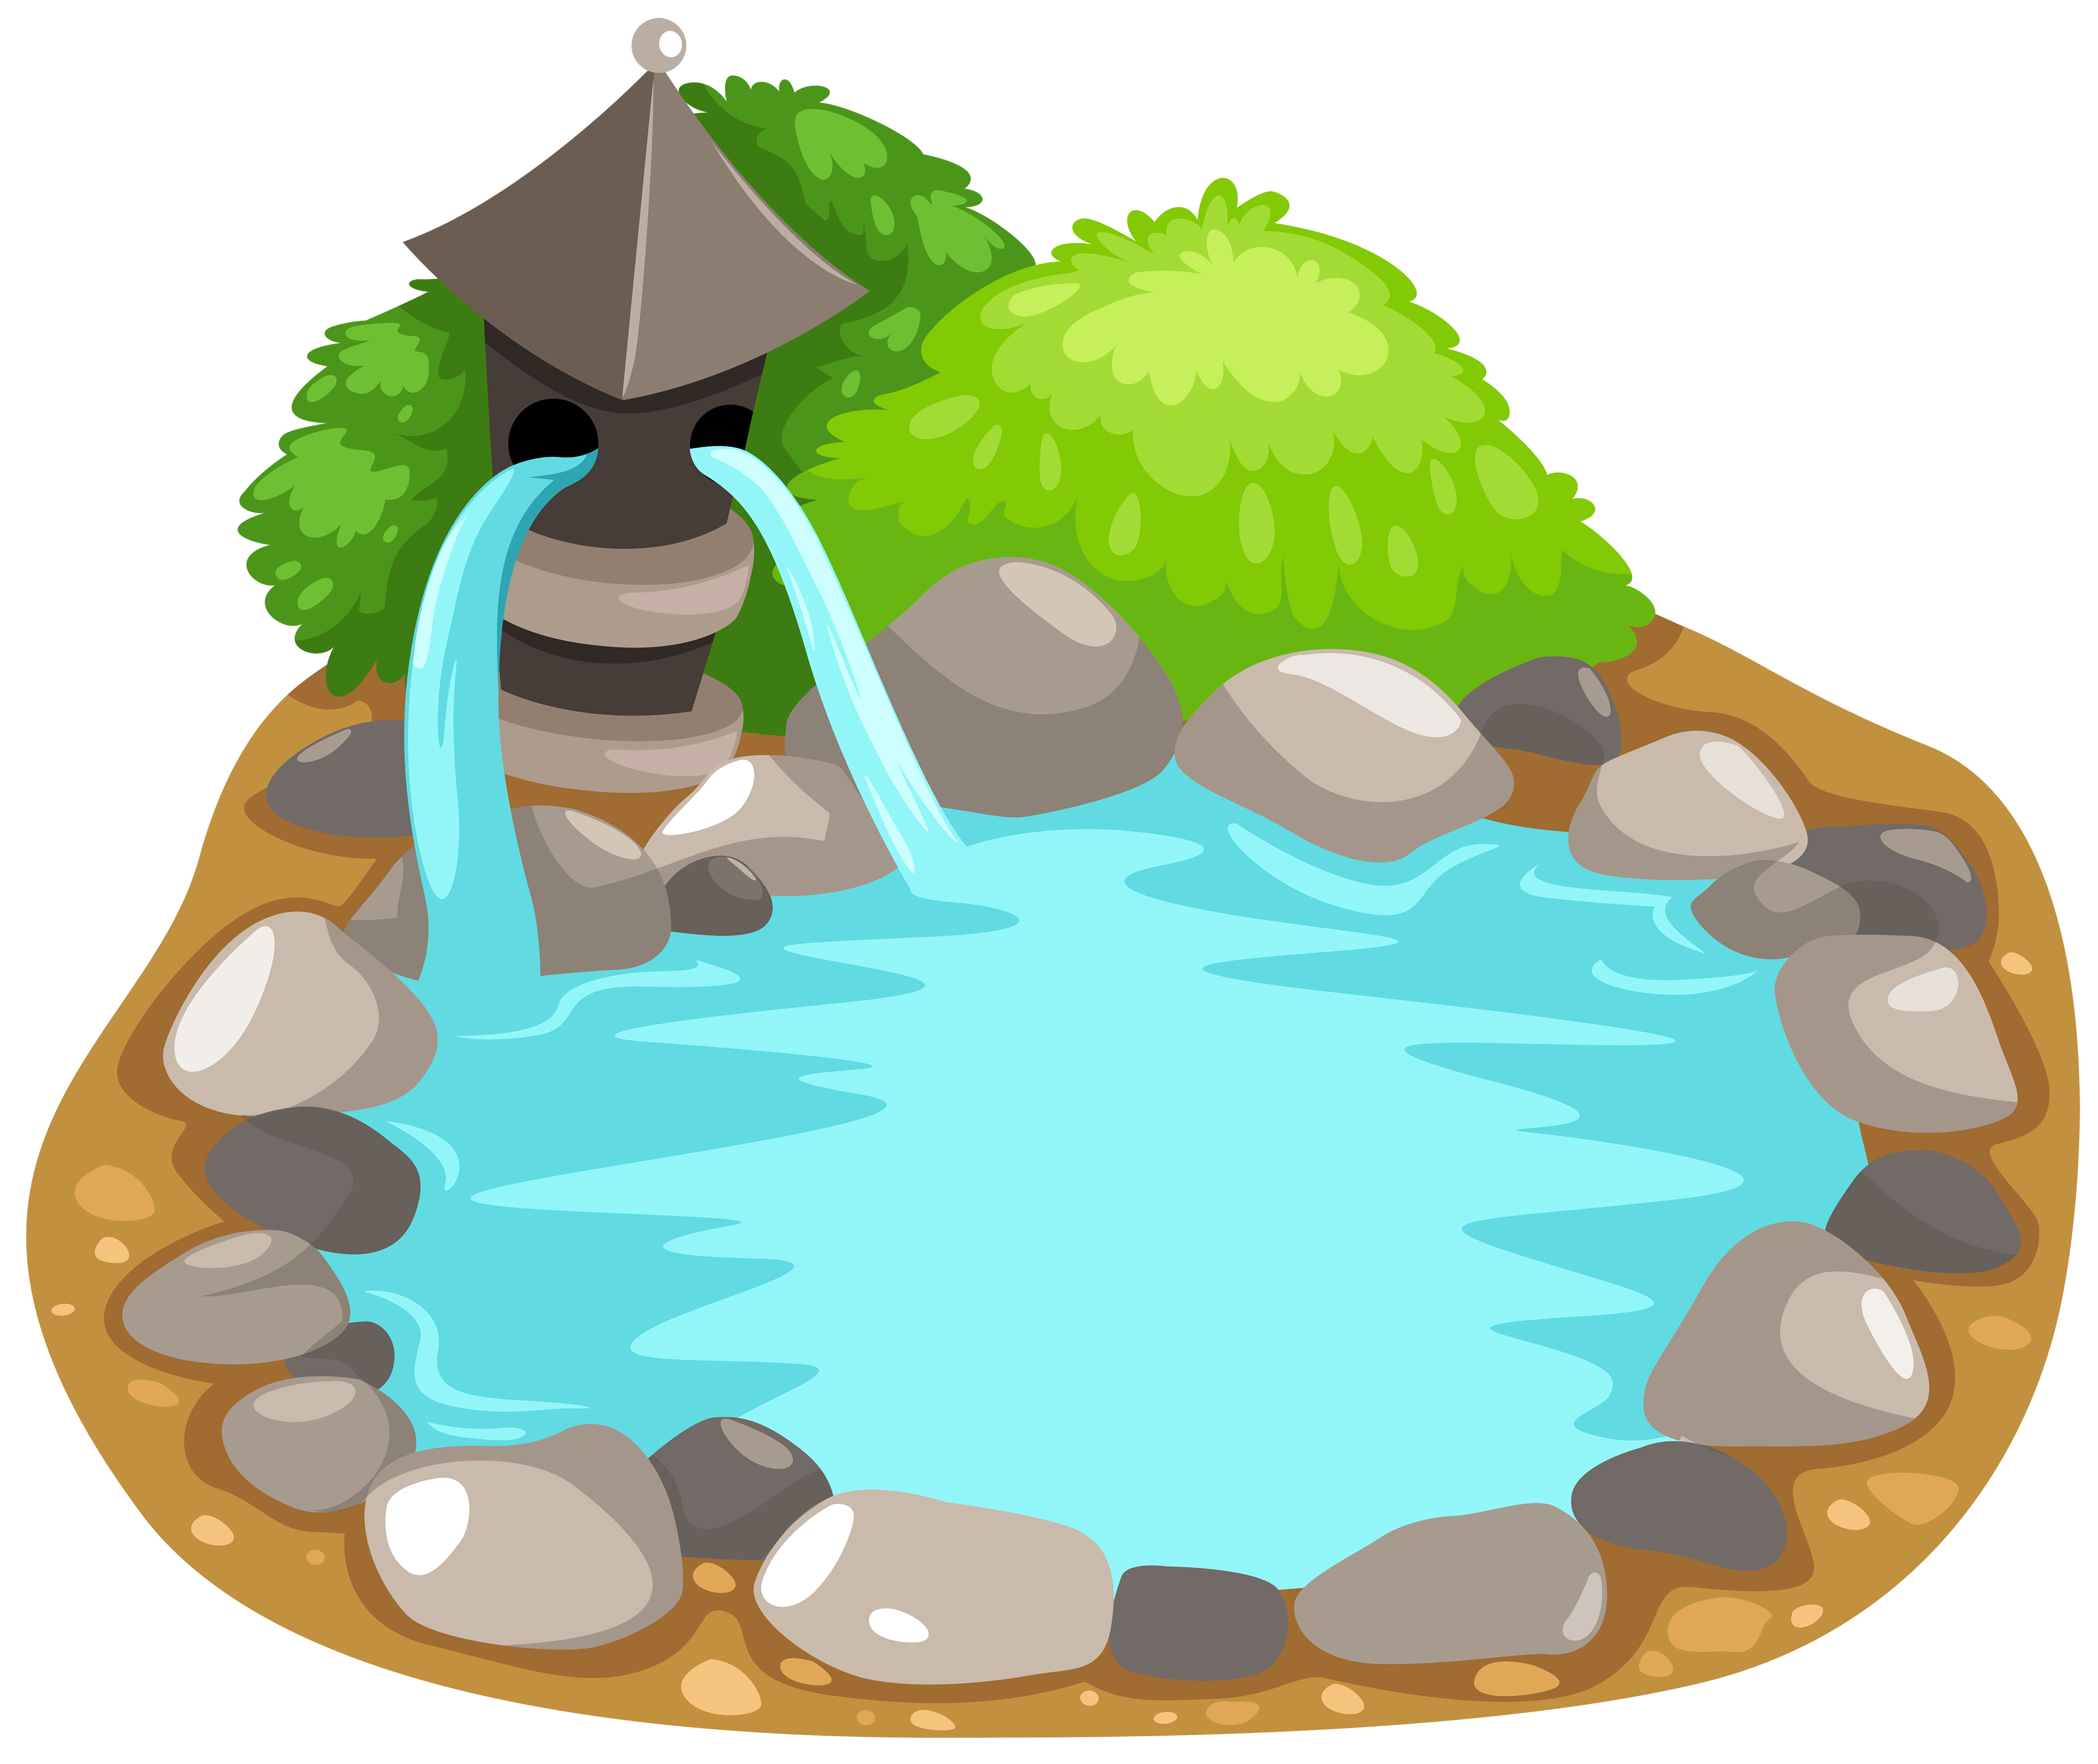 pond png clipart outdoors pinterest clip art rh pinterest com clipart panda free clipart panda free